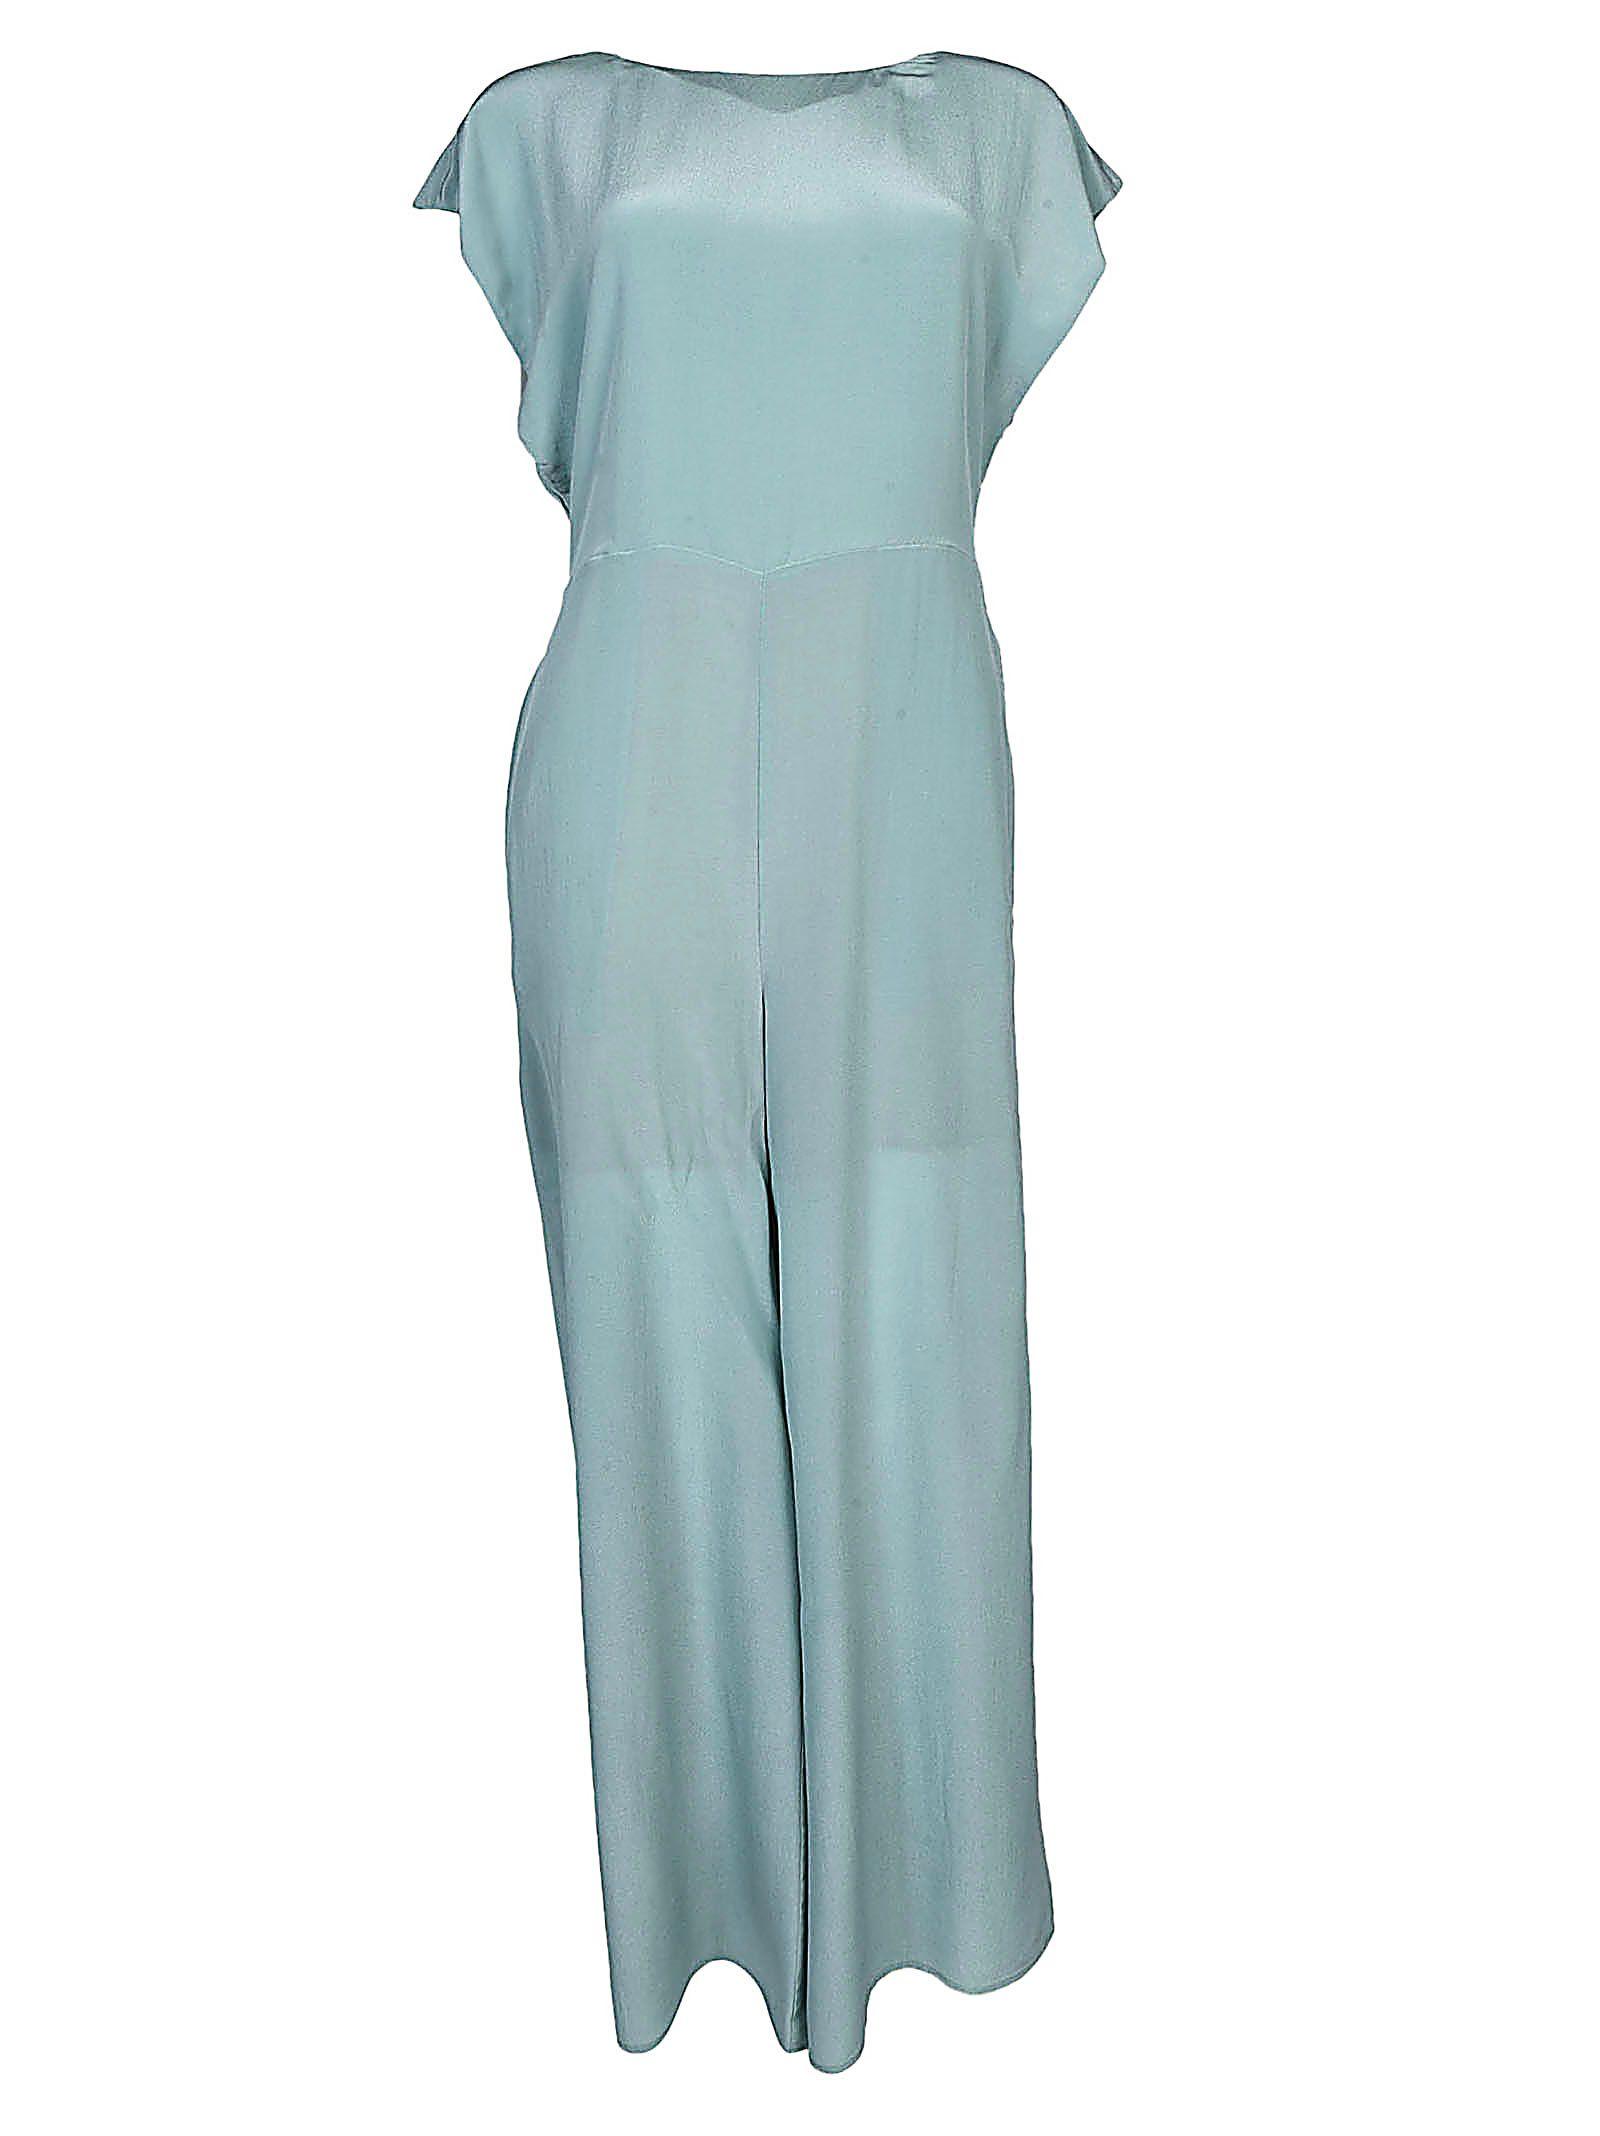 Semicouture Barret Dress